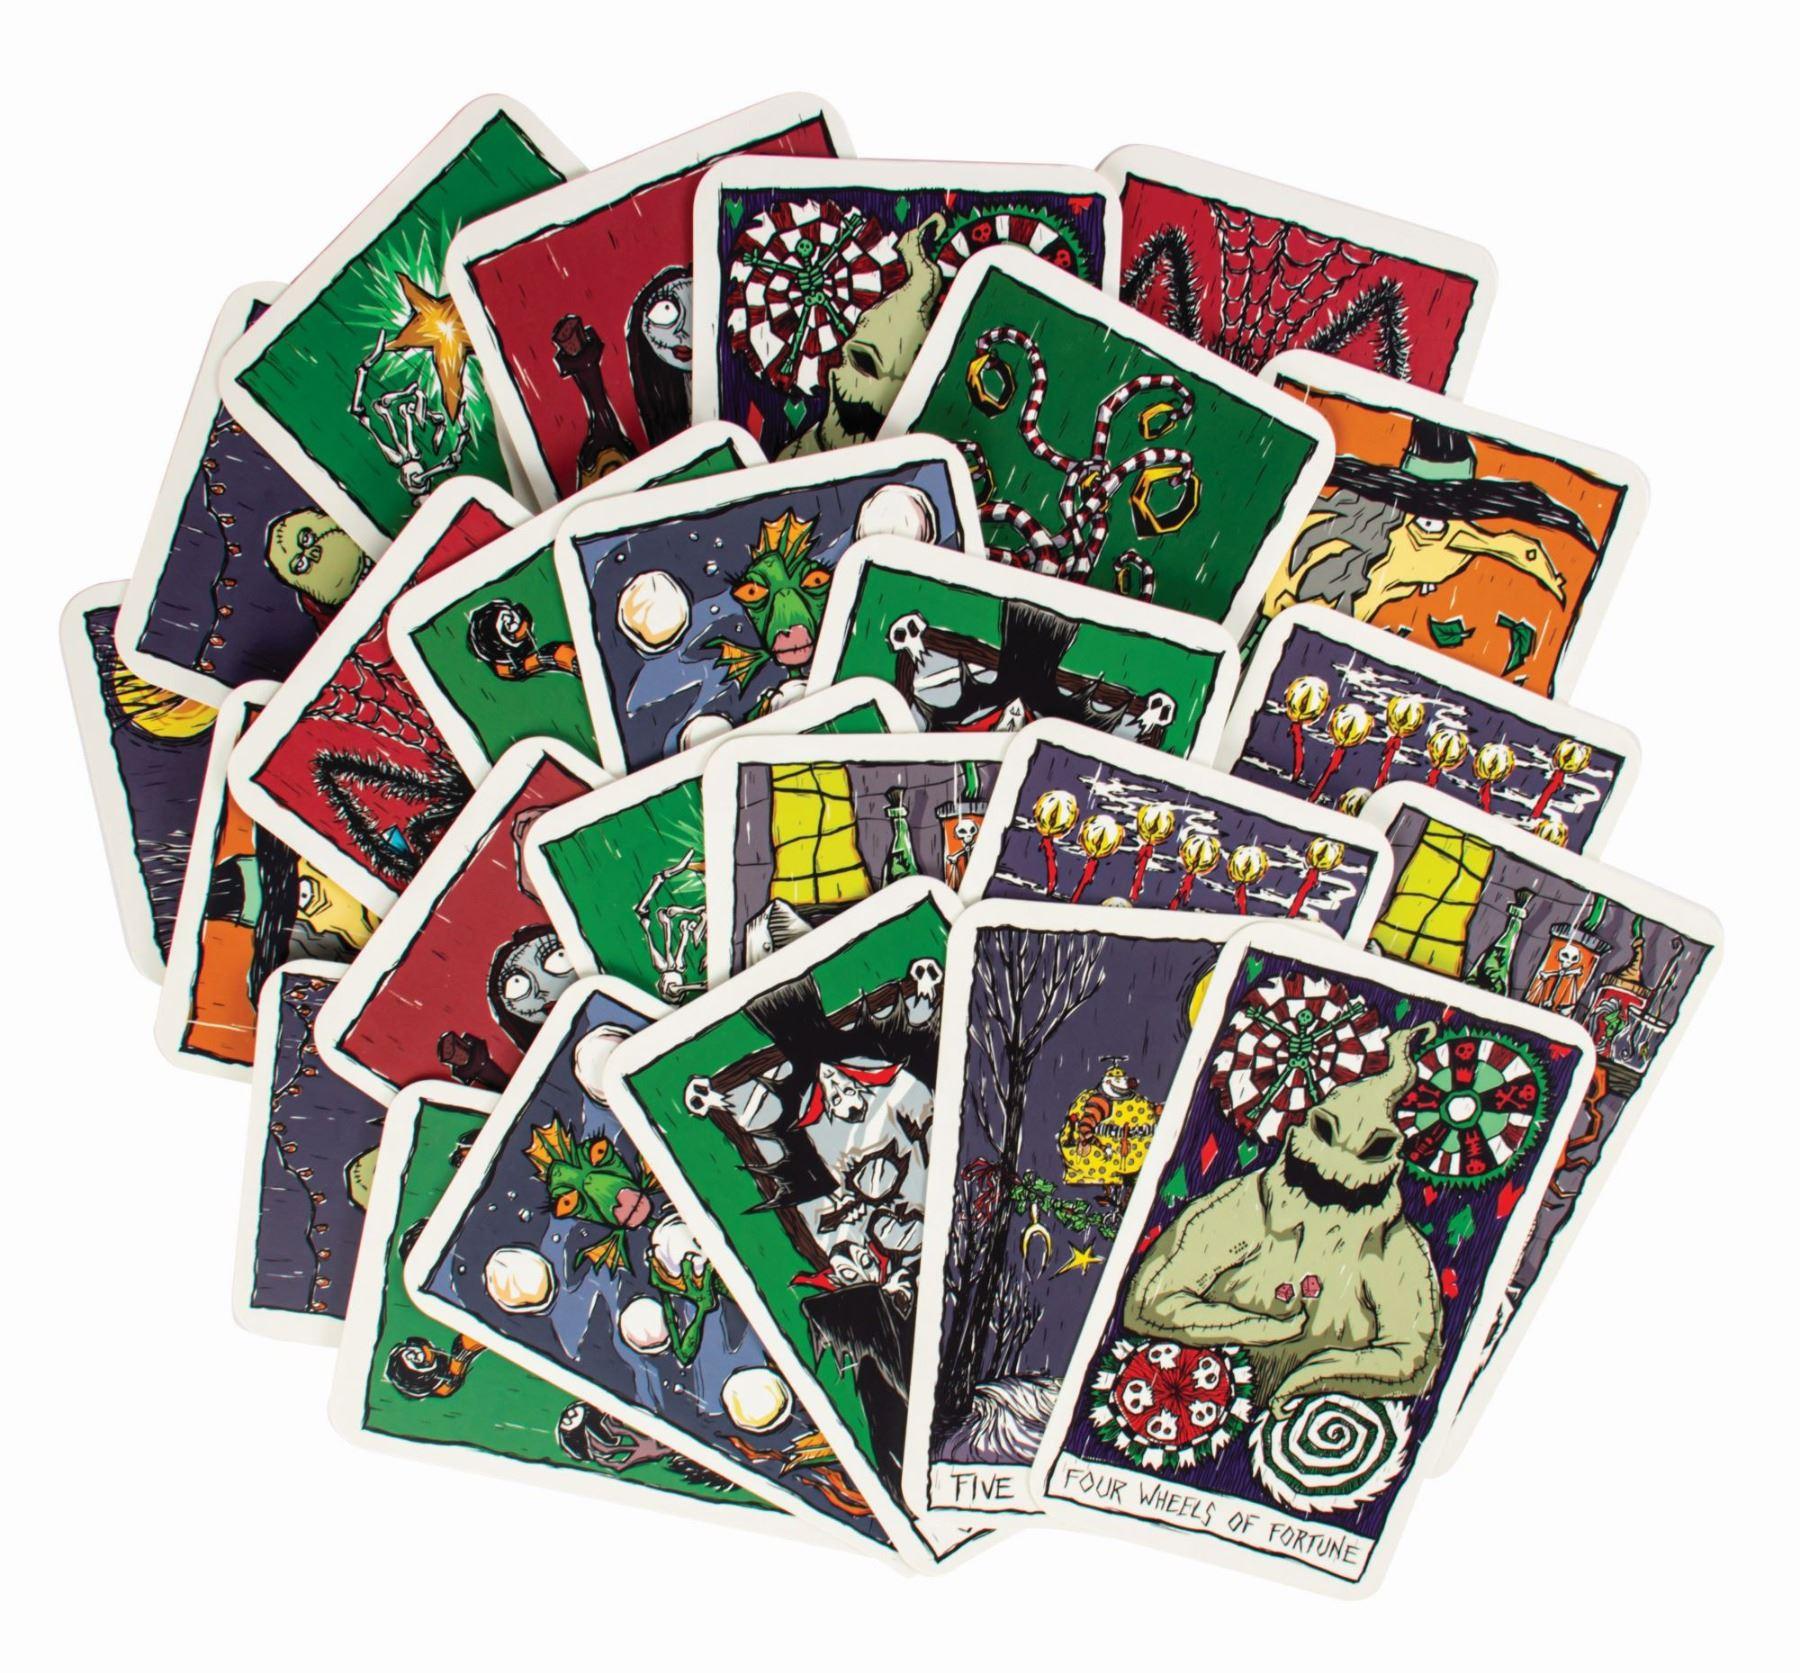 The Nightmare Before Christmas Tarot Deck